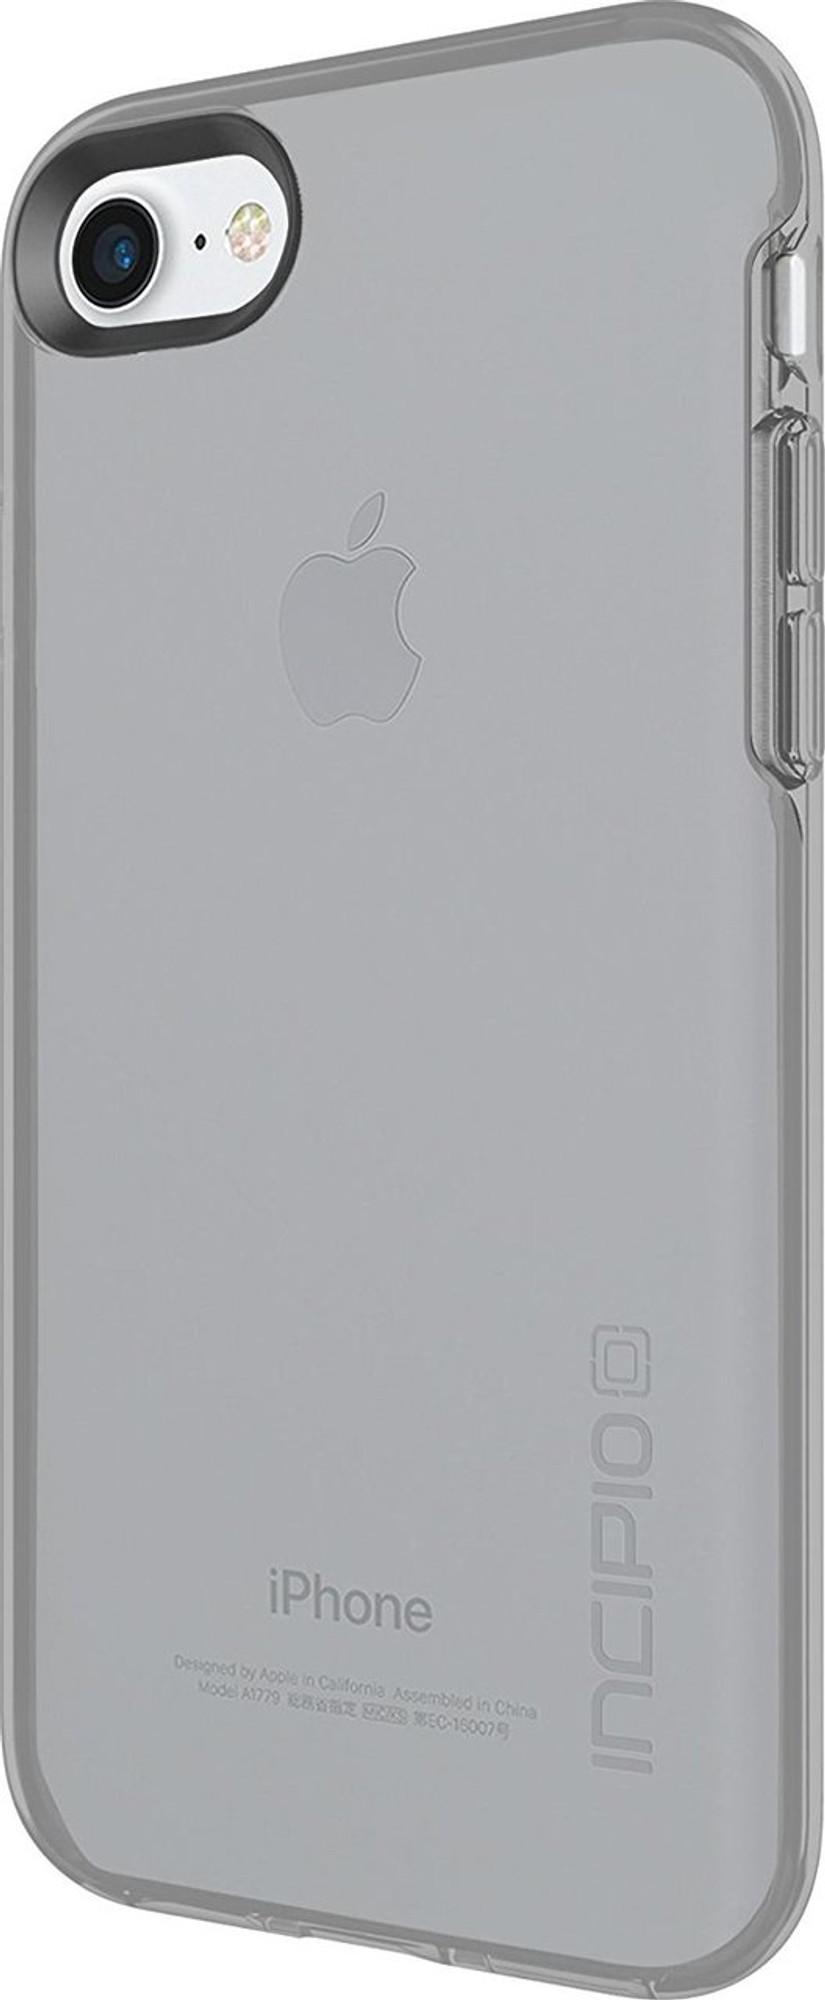 best service e7c41 01c5c Incipio Haven Pure for iPhone 7 - Smoke